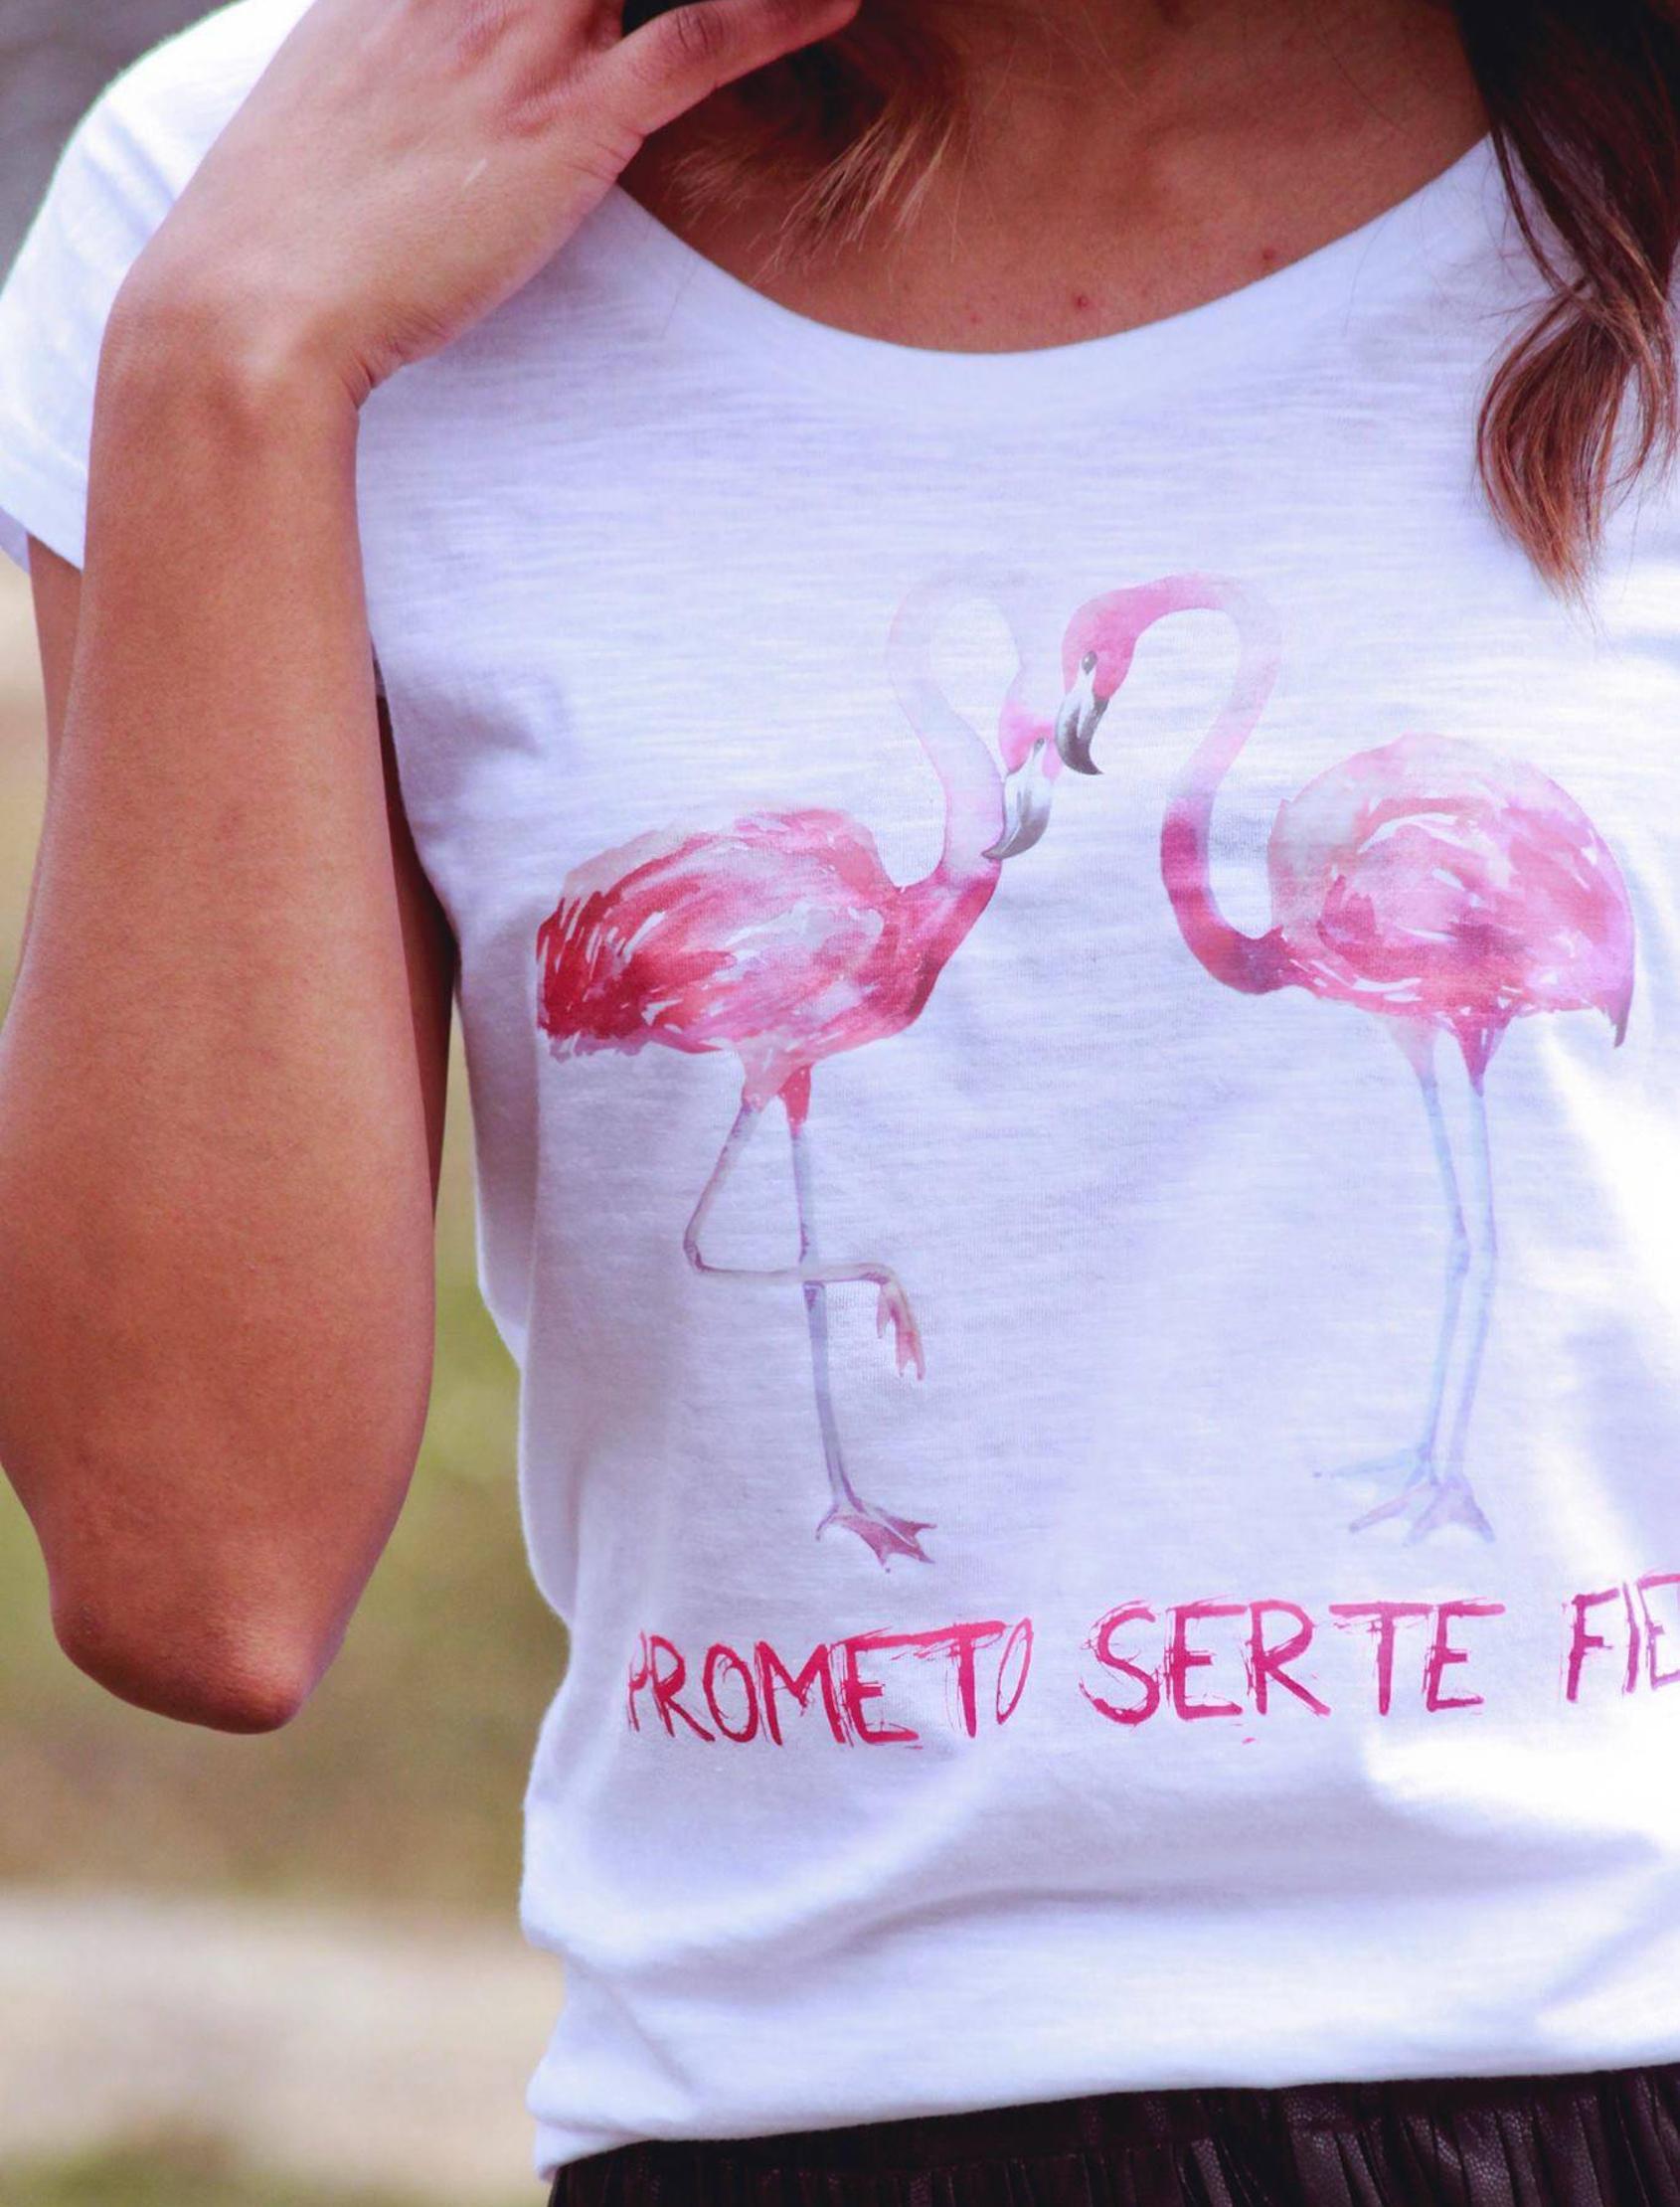 CamisetaPROMETO_01